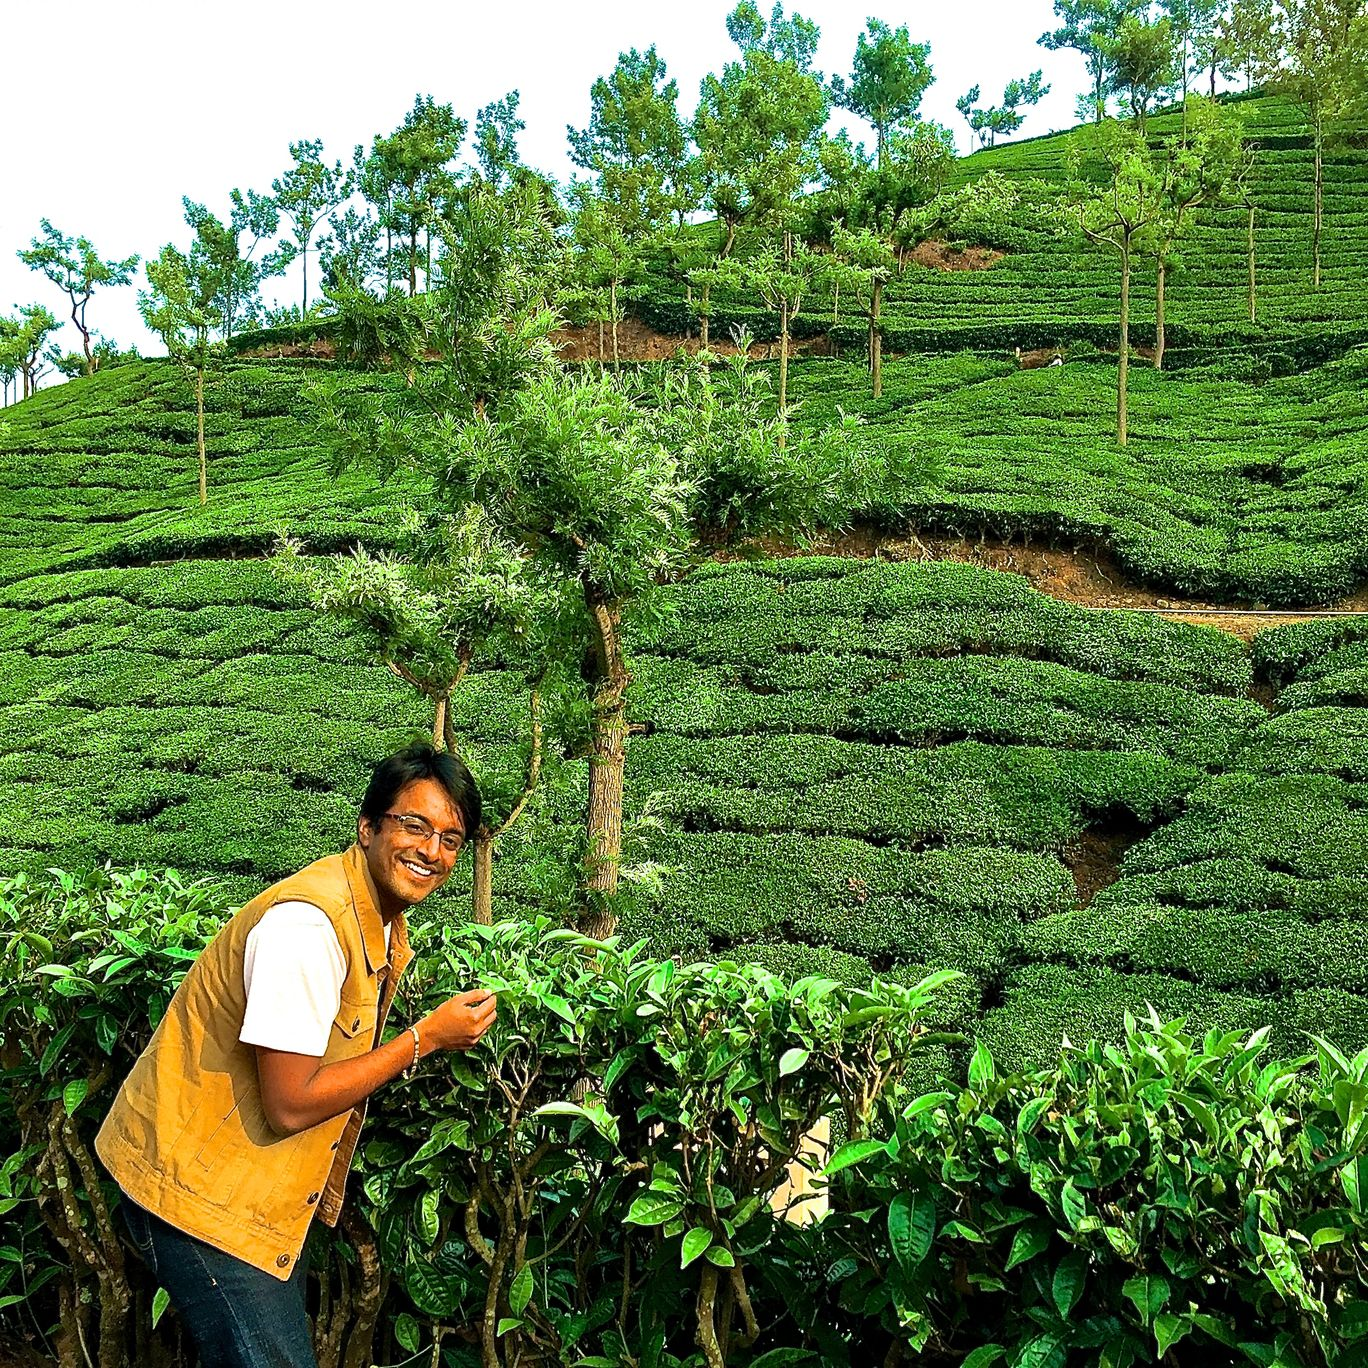 Photo of India By Rararaasta